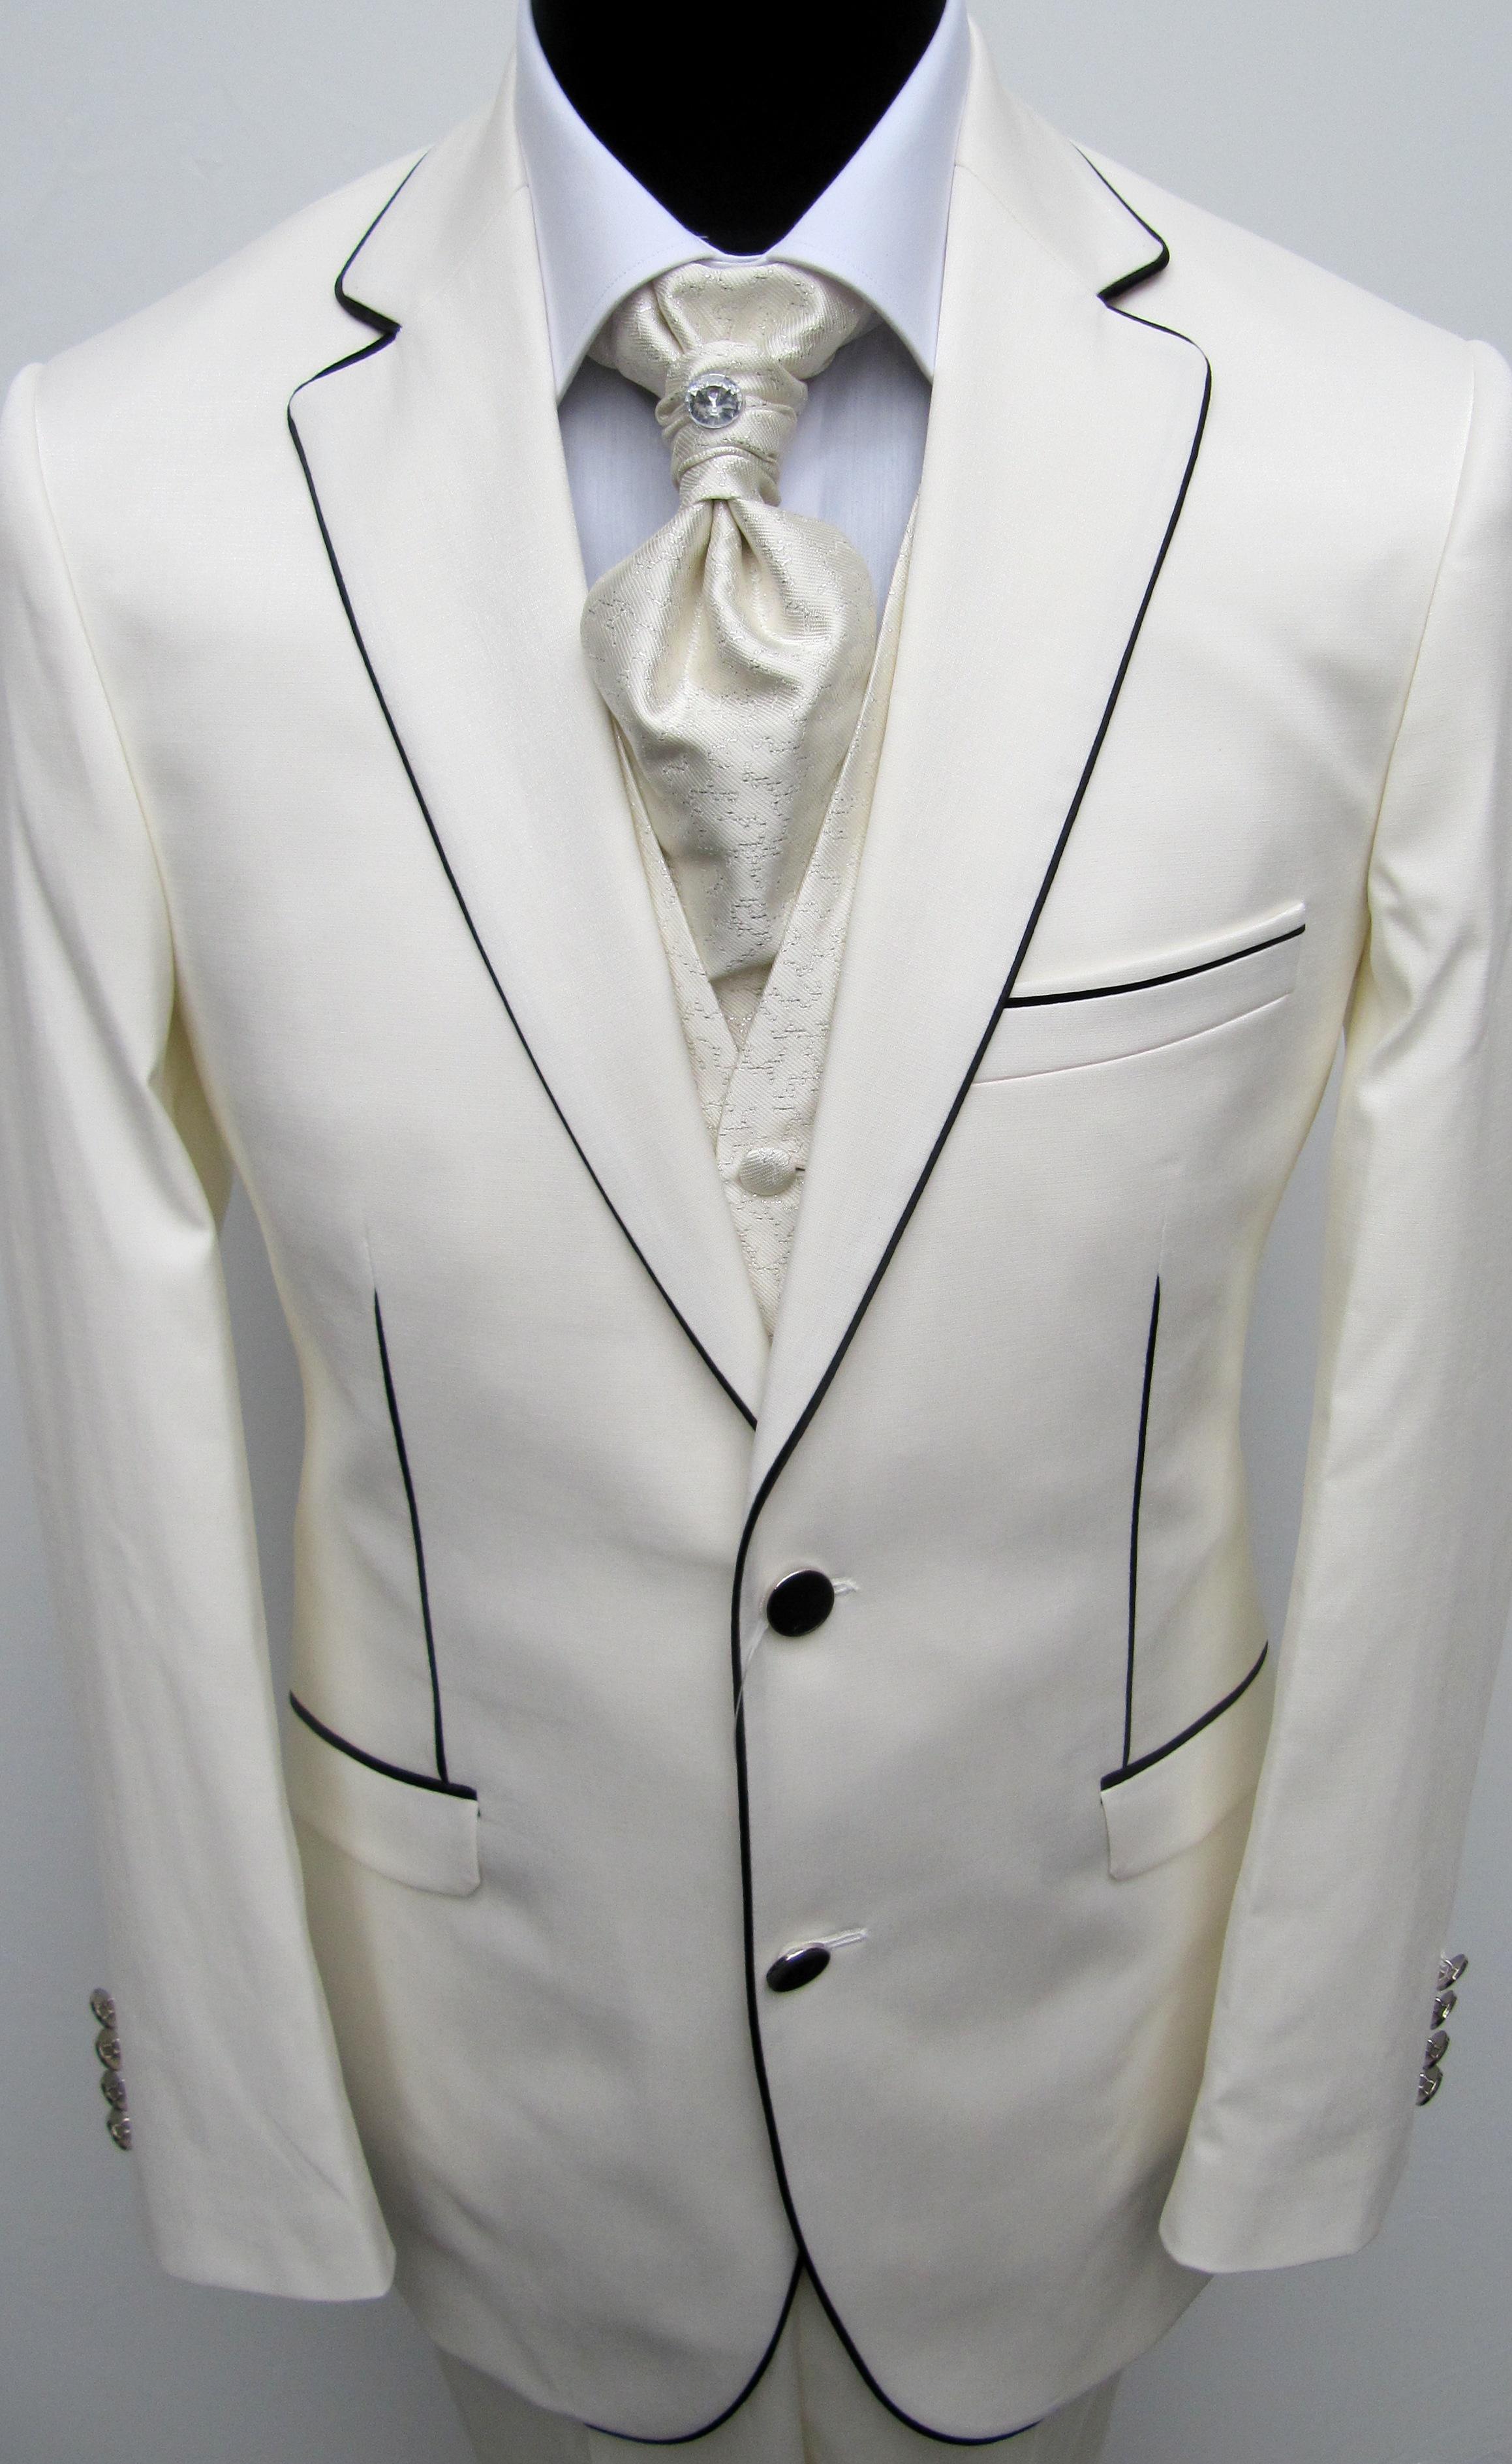 151 muga traje de novio wien ropa hombre traje boda - Ropa interior novio ...